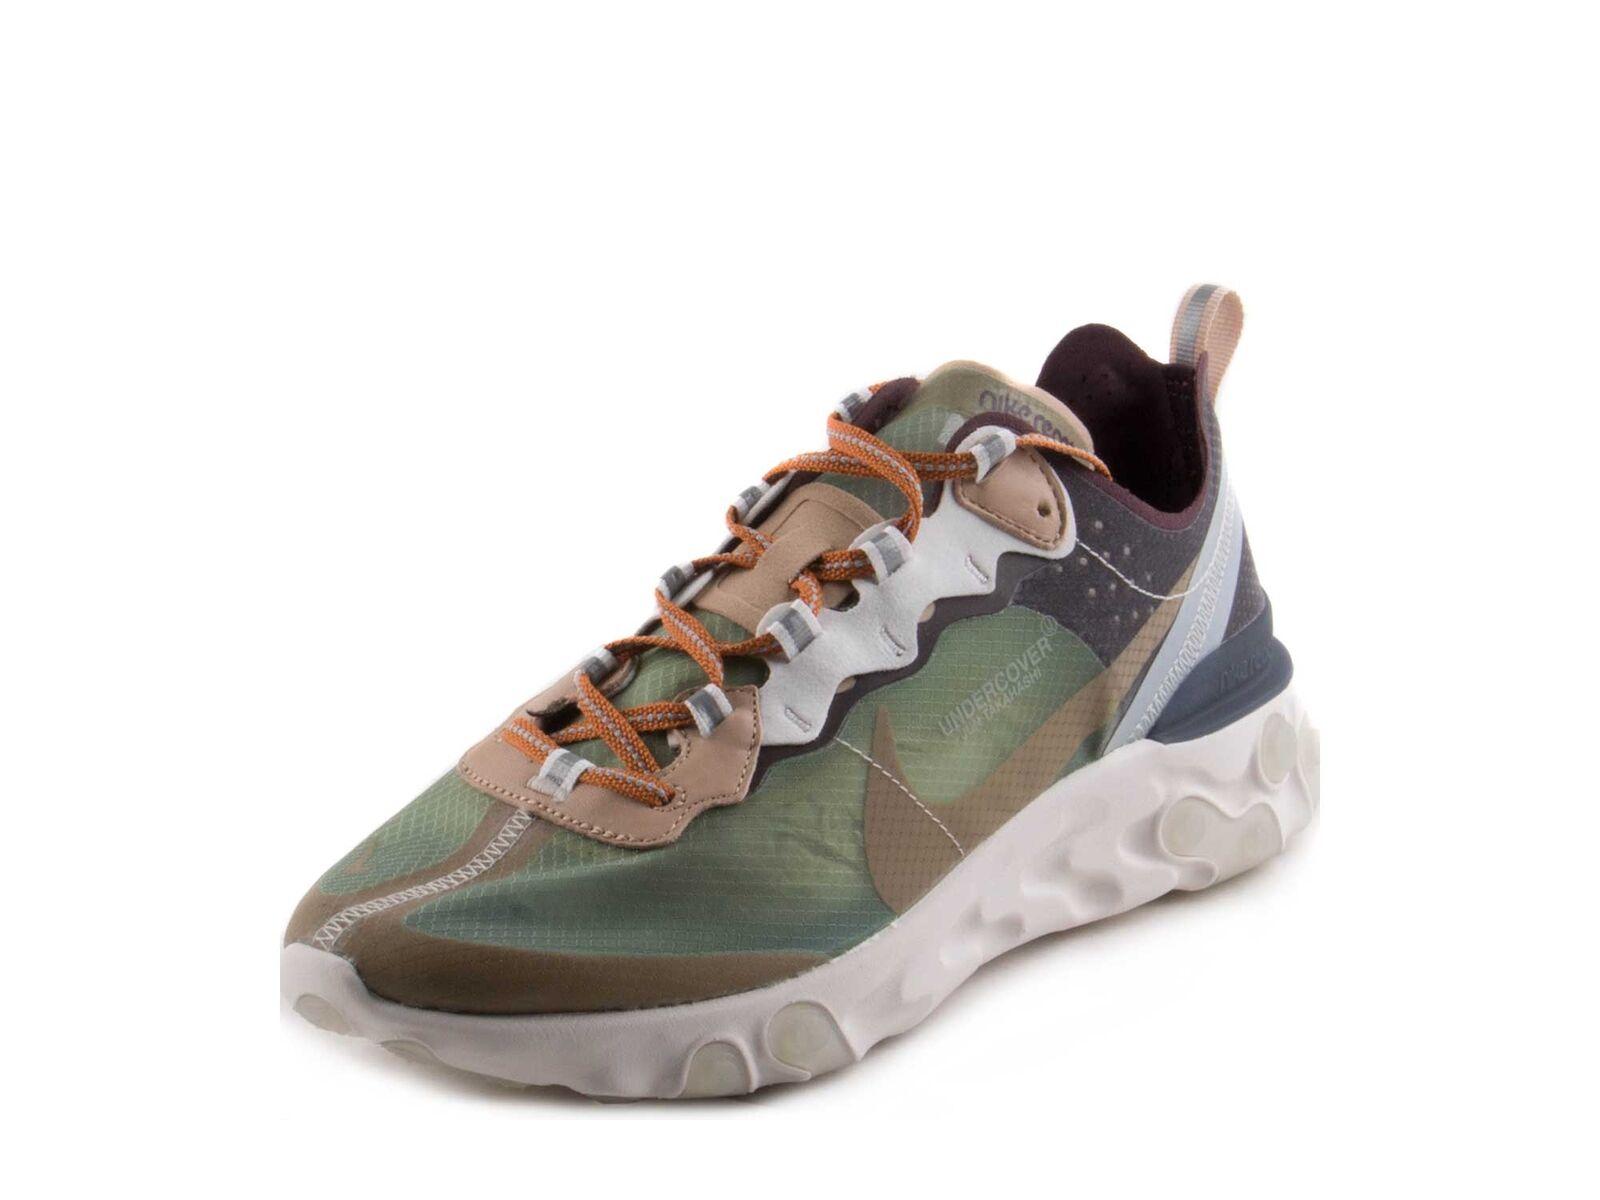 Nike Mist/Linen-Summit Uomo React Element 87 X Undercover verde Mist/Linen-Summit Nike bianca BQ2718-300 e49b7b